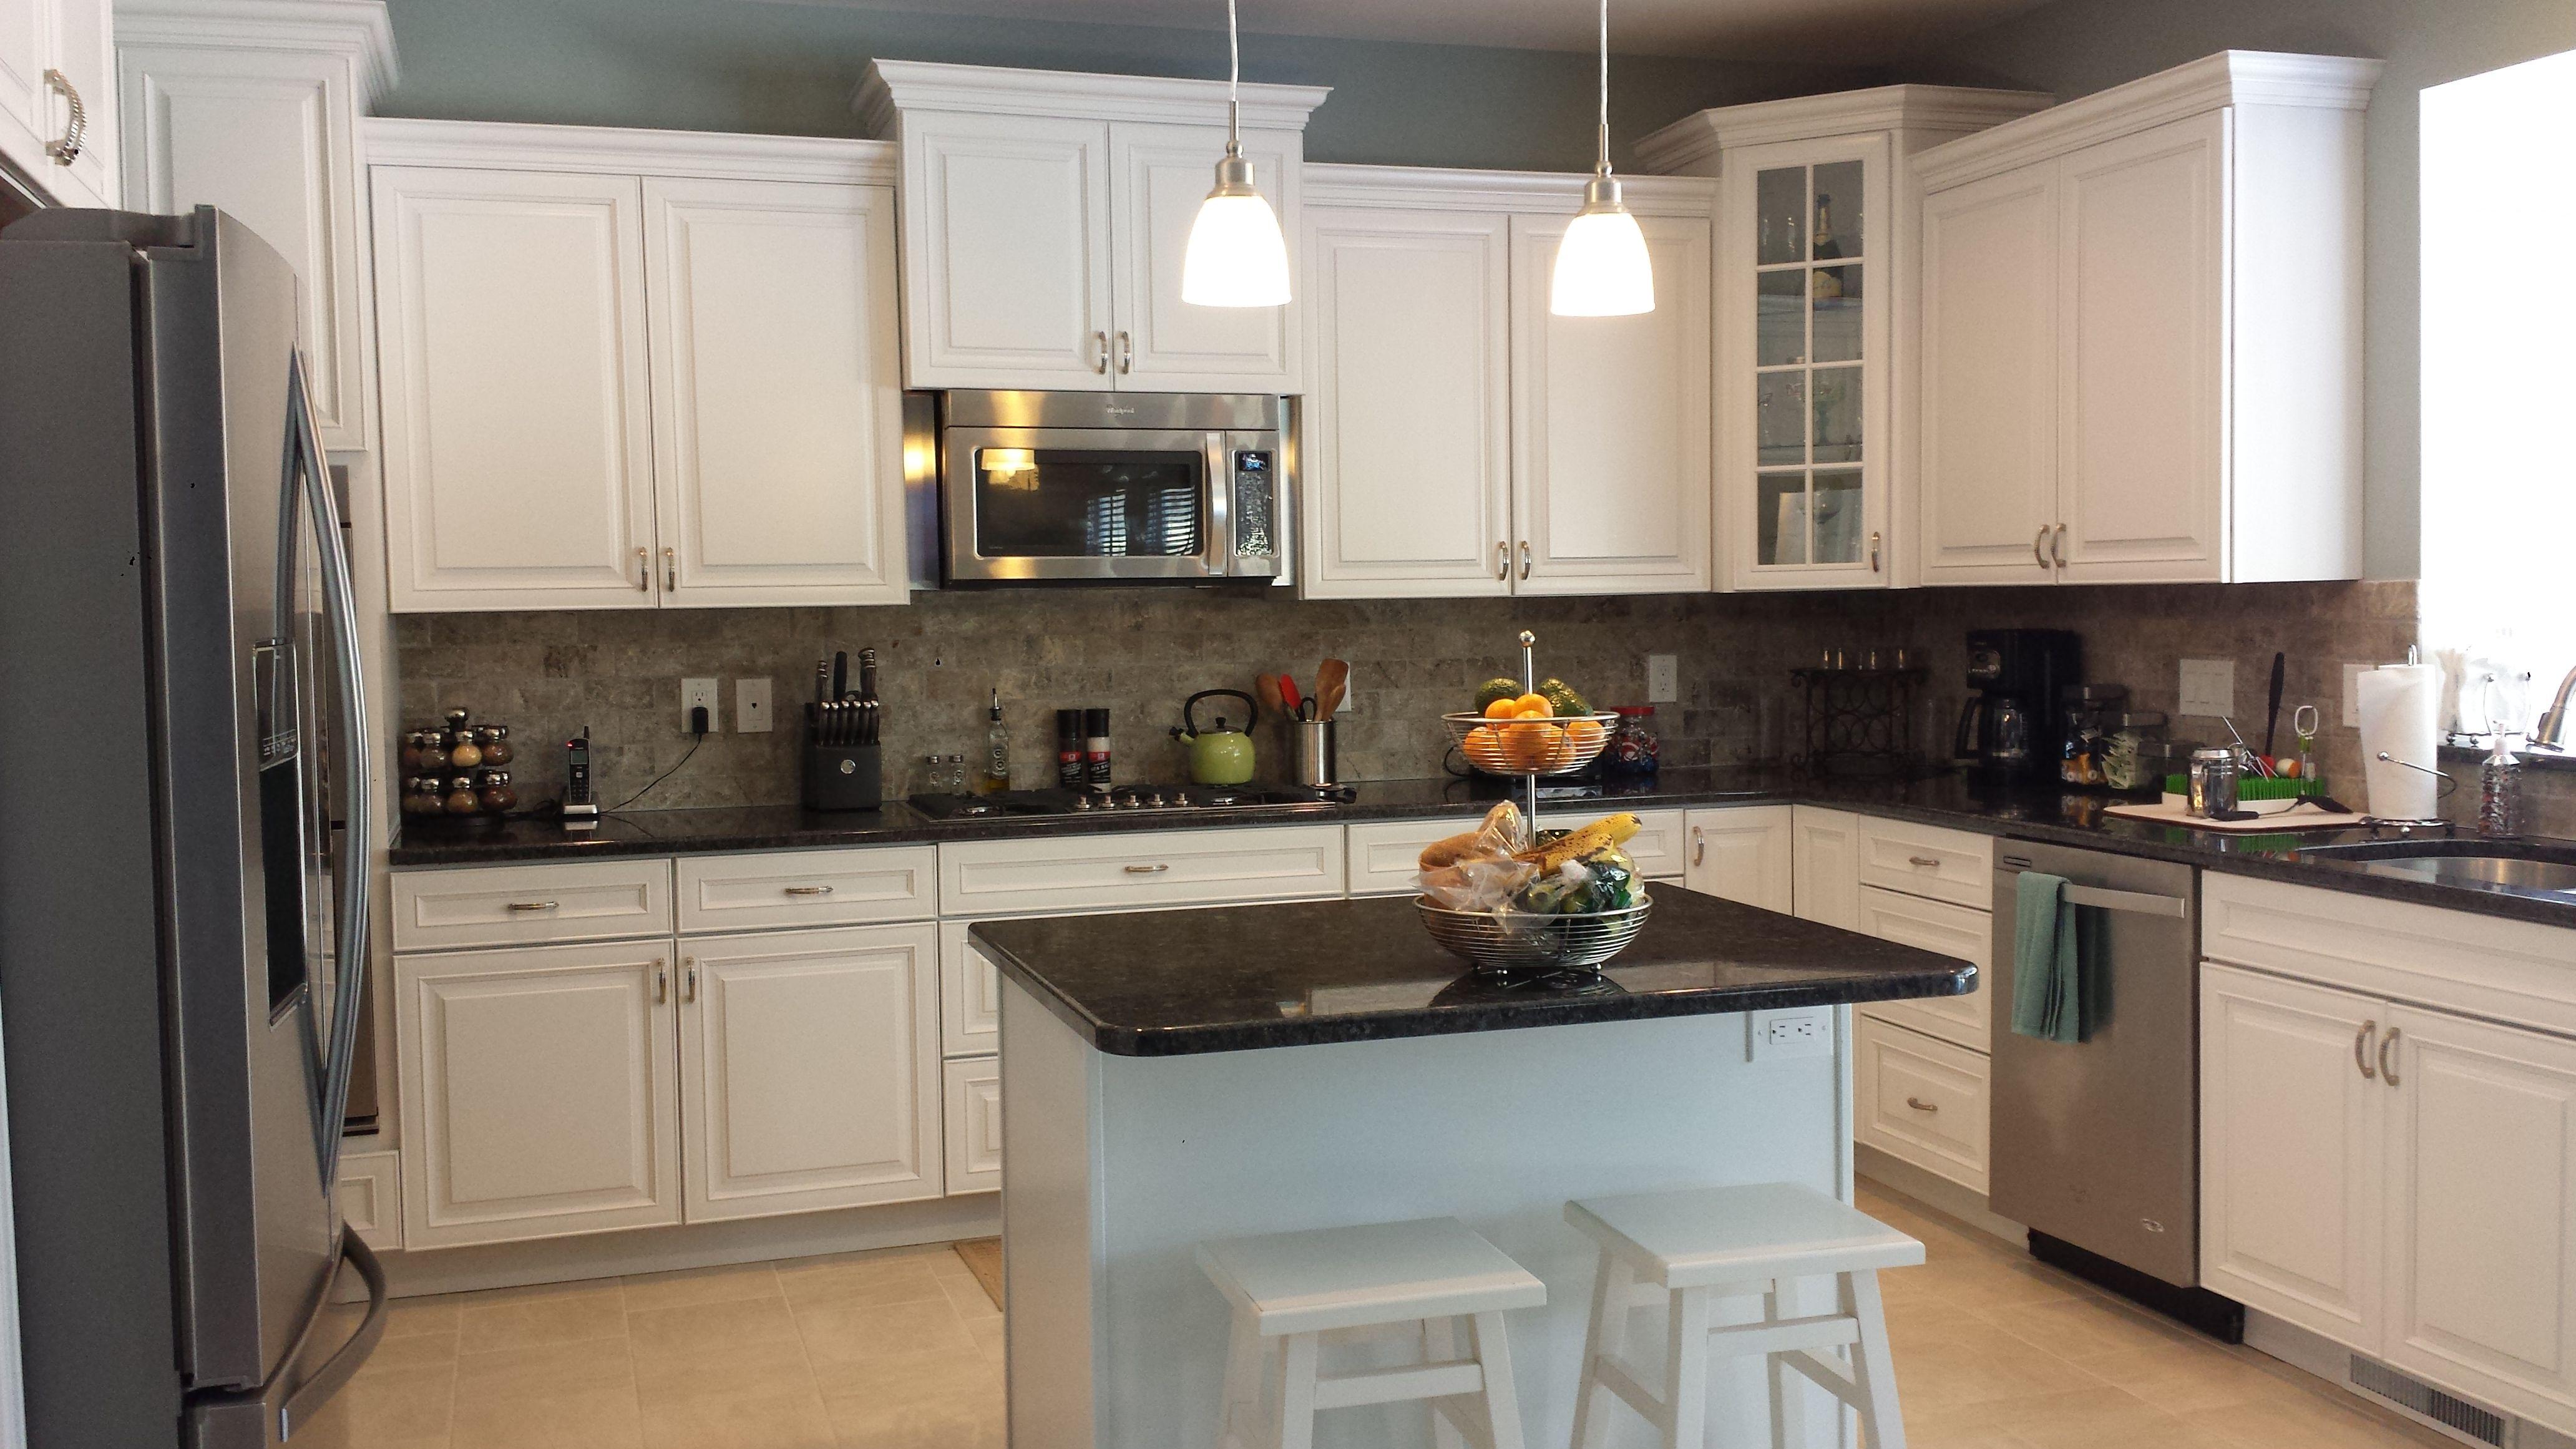 Streater Kitchen Designed By Thomas Matteo #kitchen #kraftmaid #cabinets  #microwave #granite